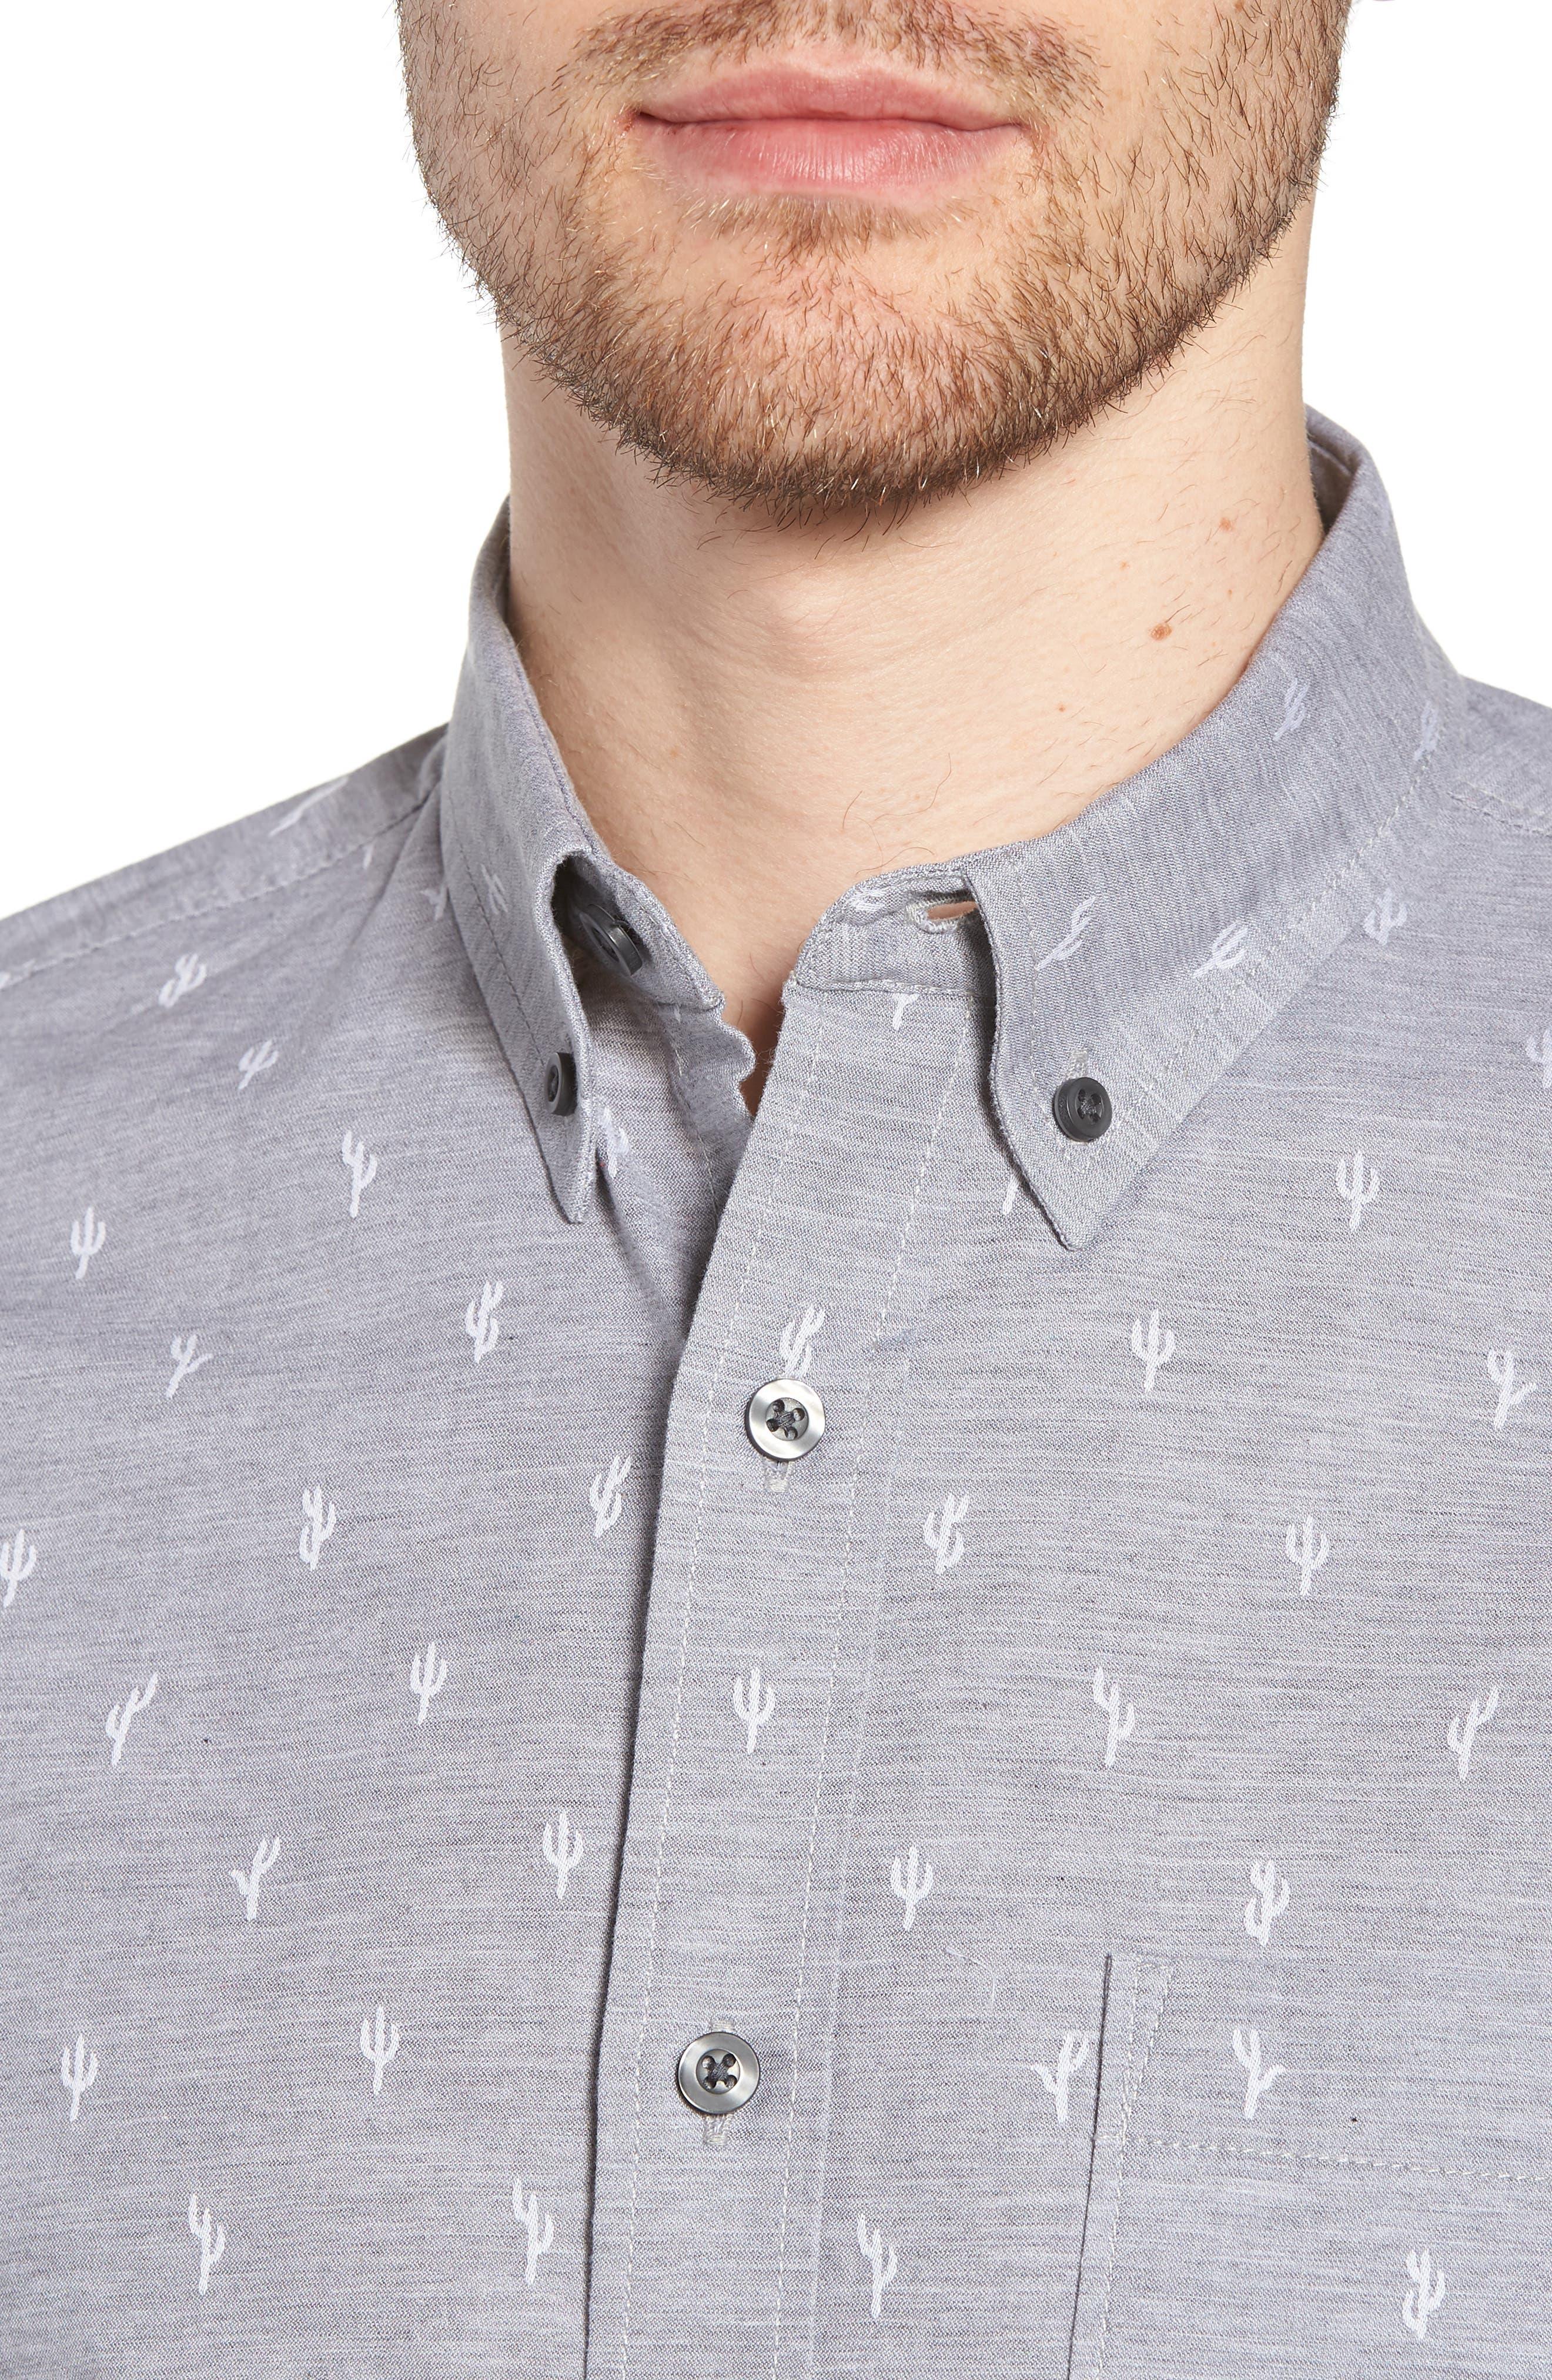 Cactus Print Dobby Sport Shirt,                             Alternate thumbnail 2, color,                             Grey Weather Cactus Dobby